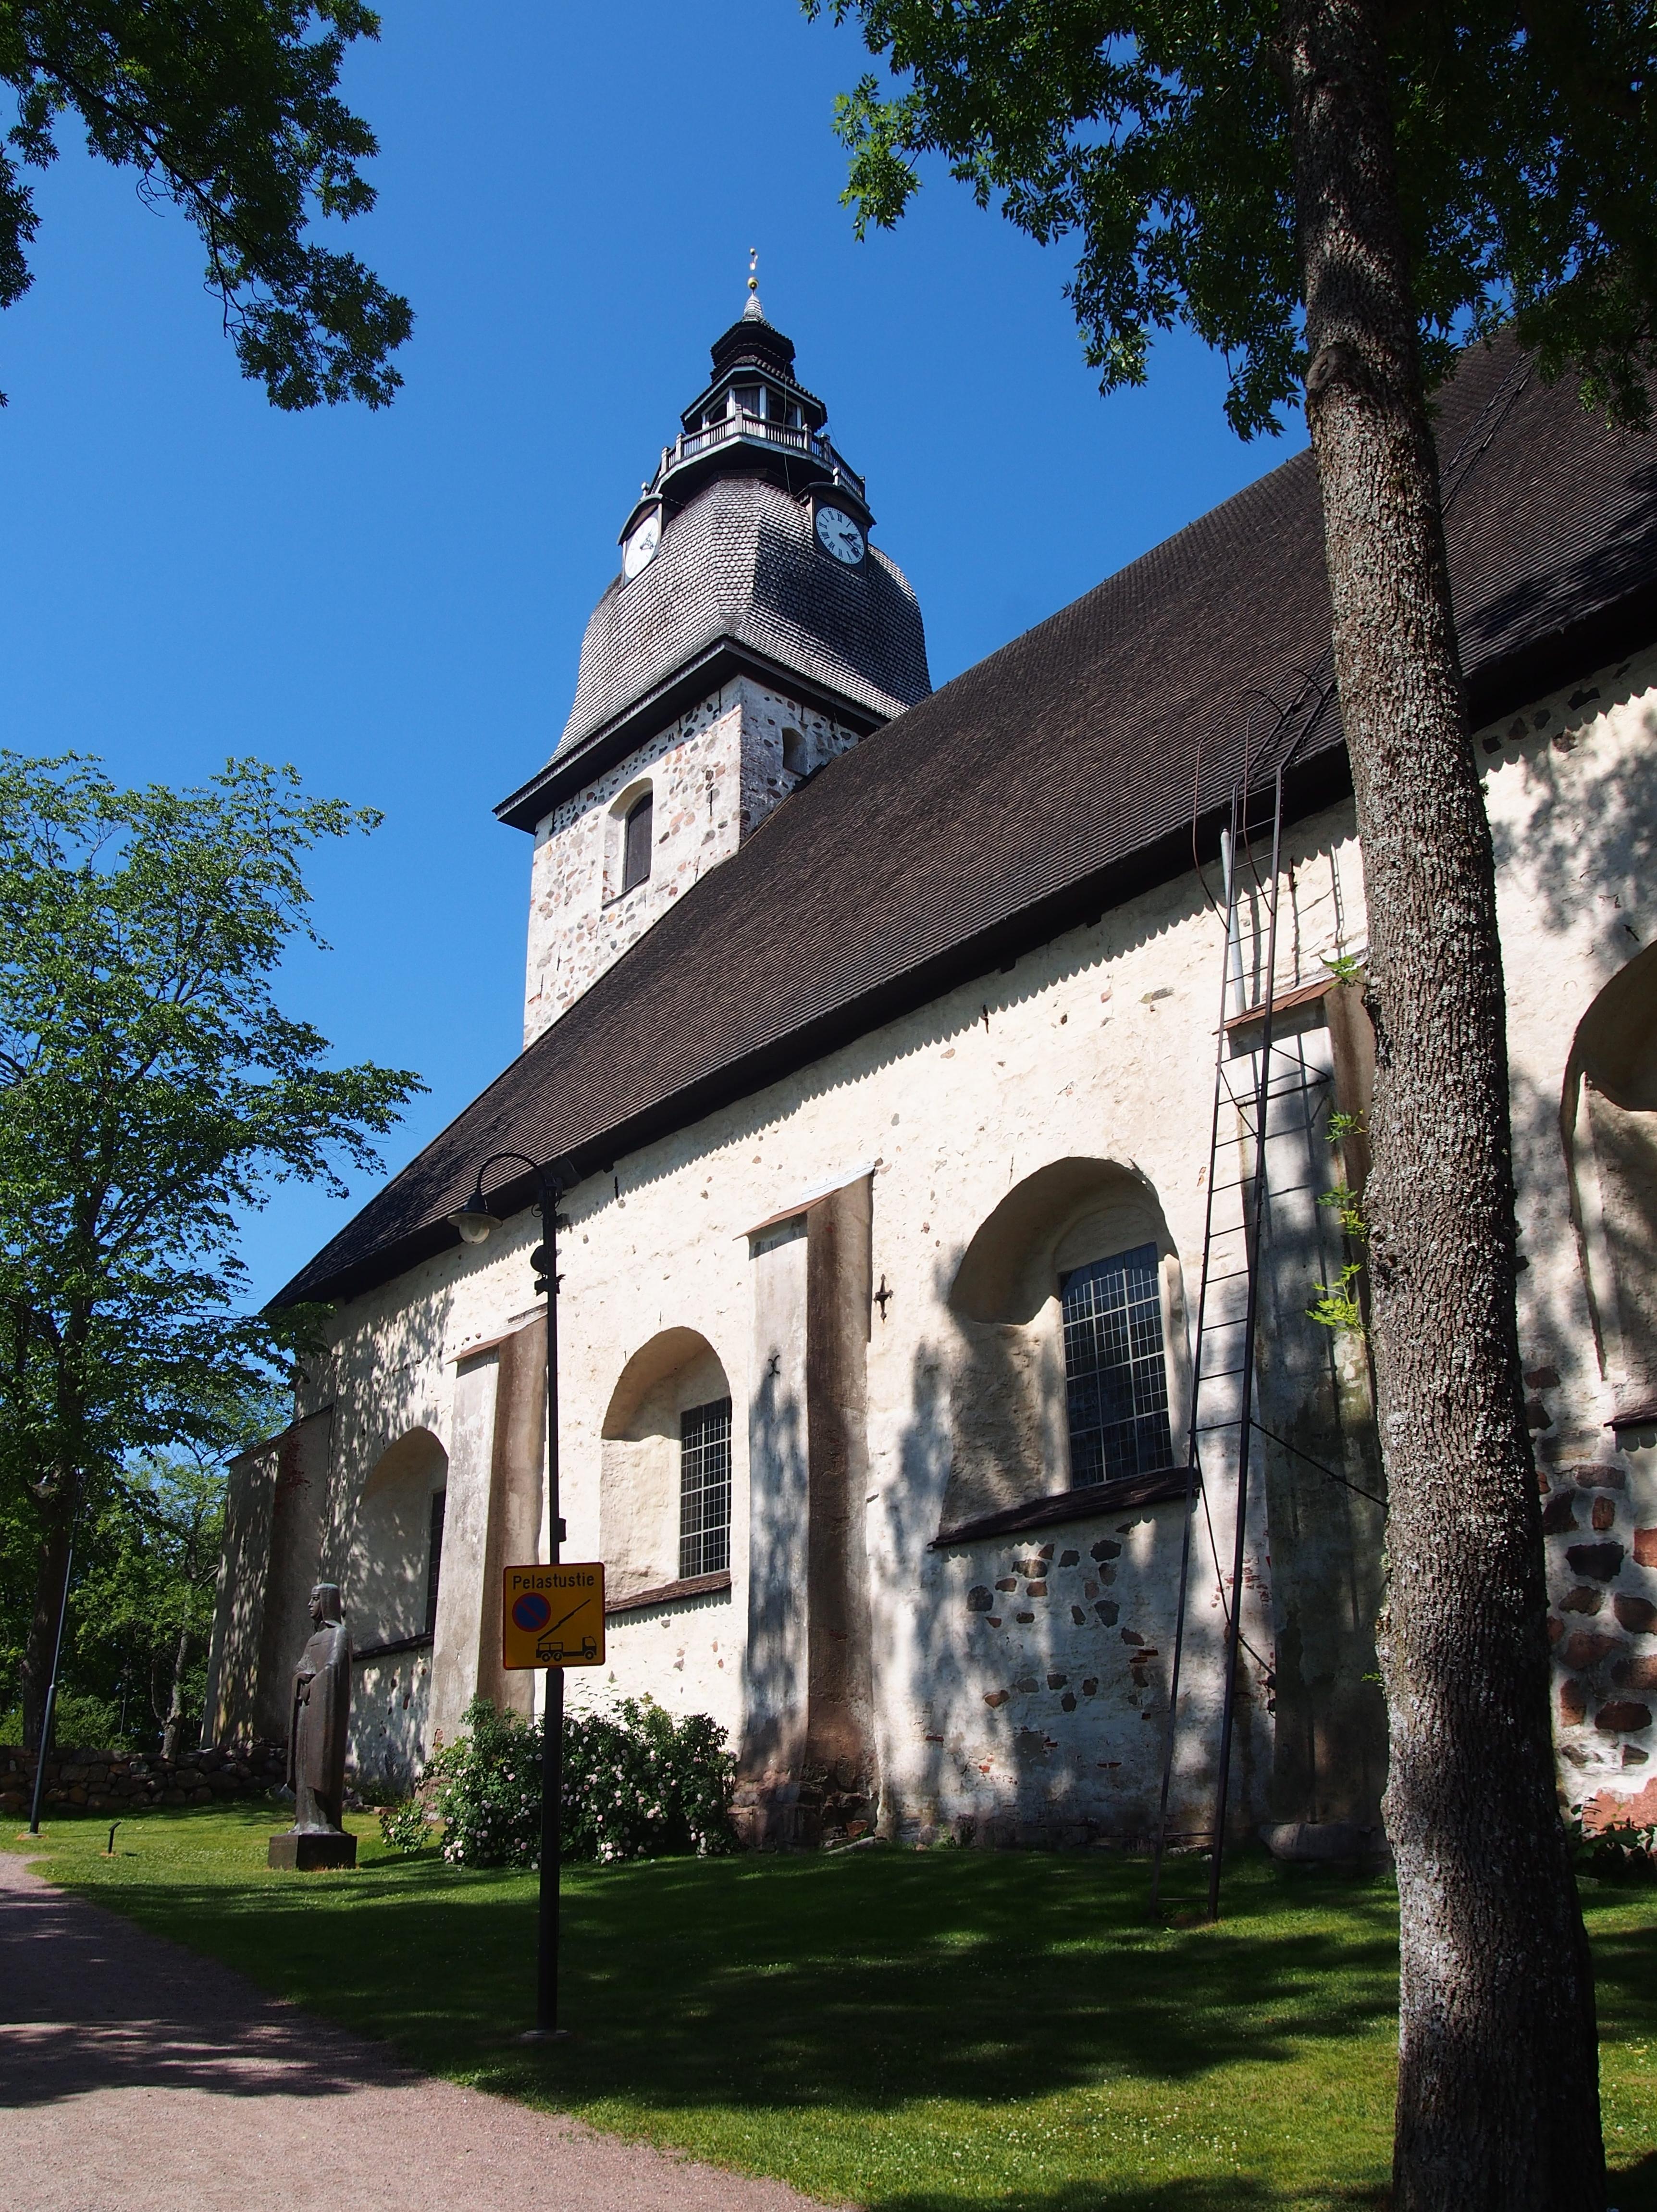 Naantali Church on 12th July 2017 1.jpg